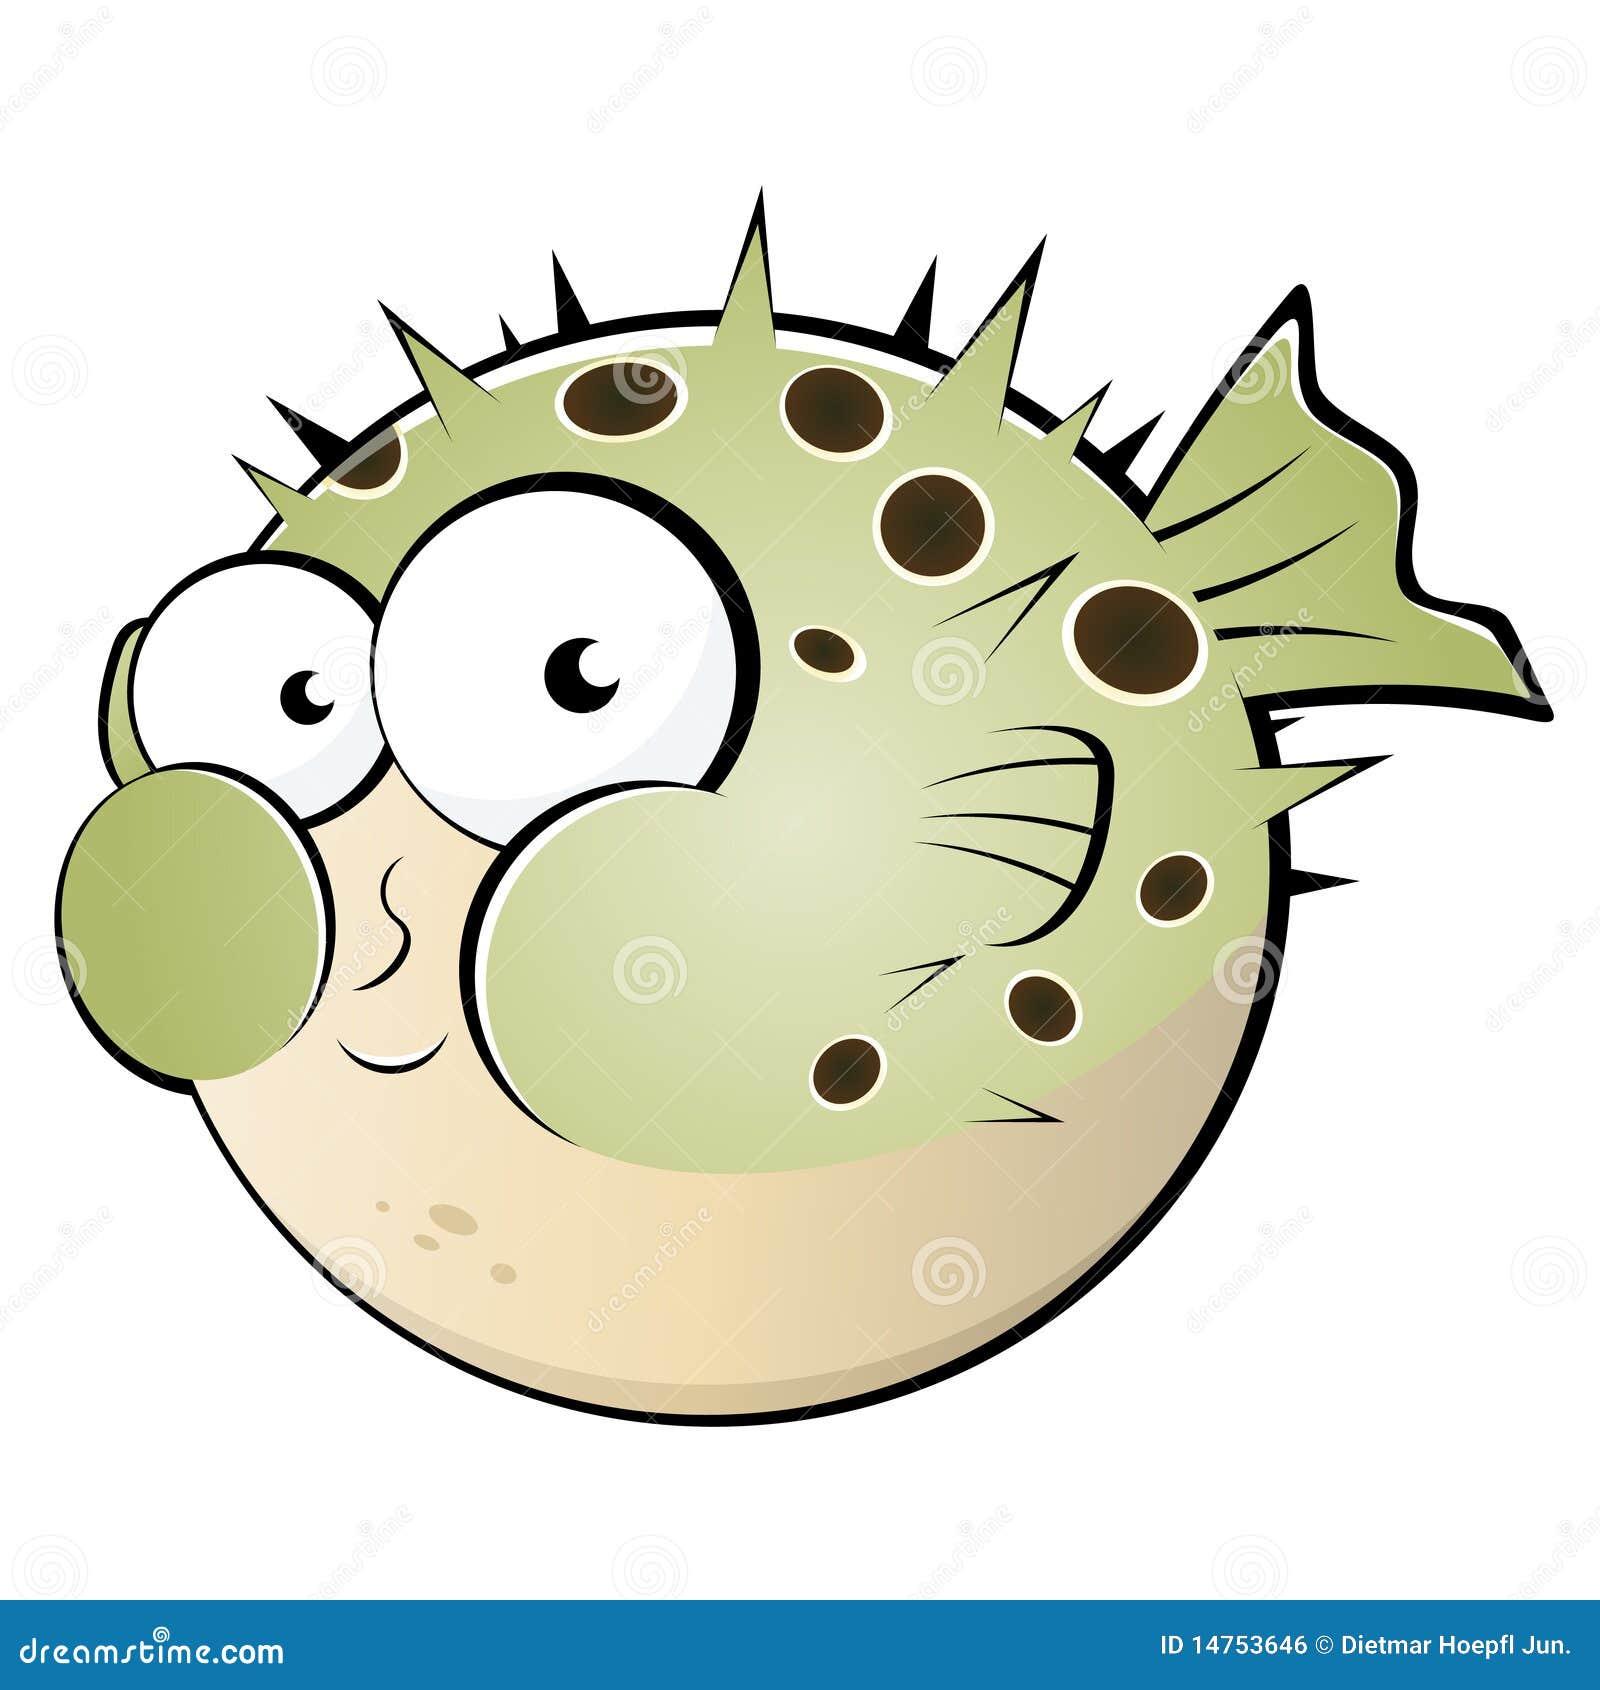 puffer fish images free wallpaper | 1300 x 1390 jpeg 110kB